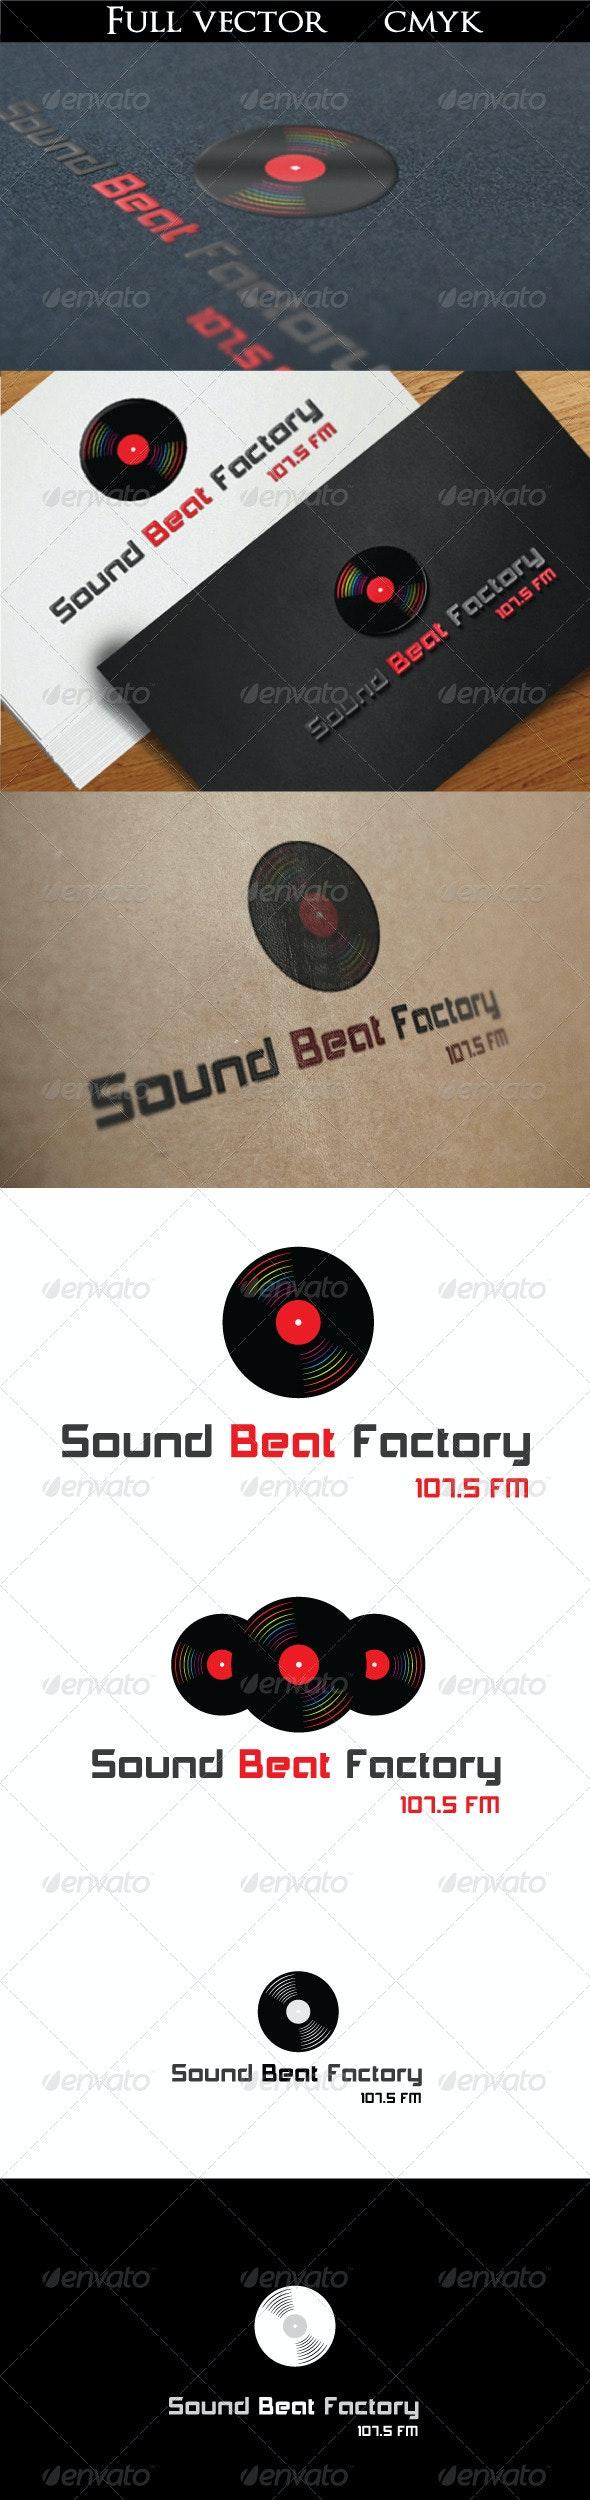 Sound Beat Factory Logo - Objects Logo Templates